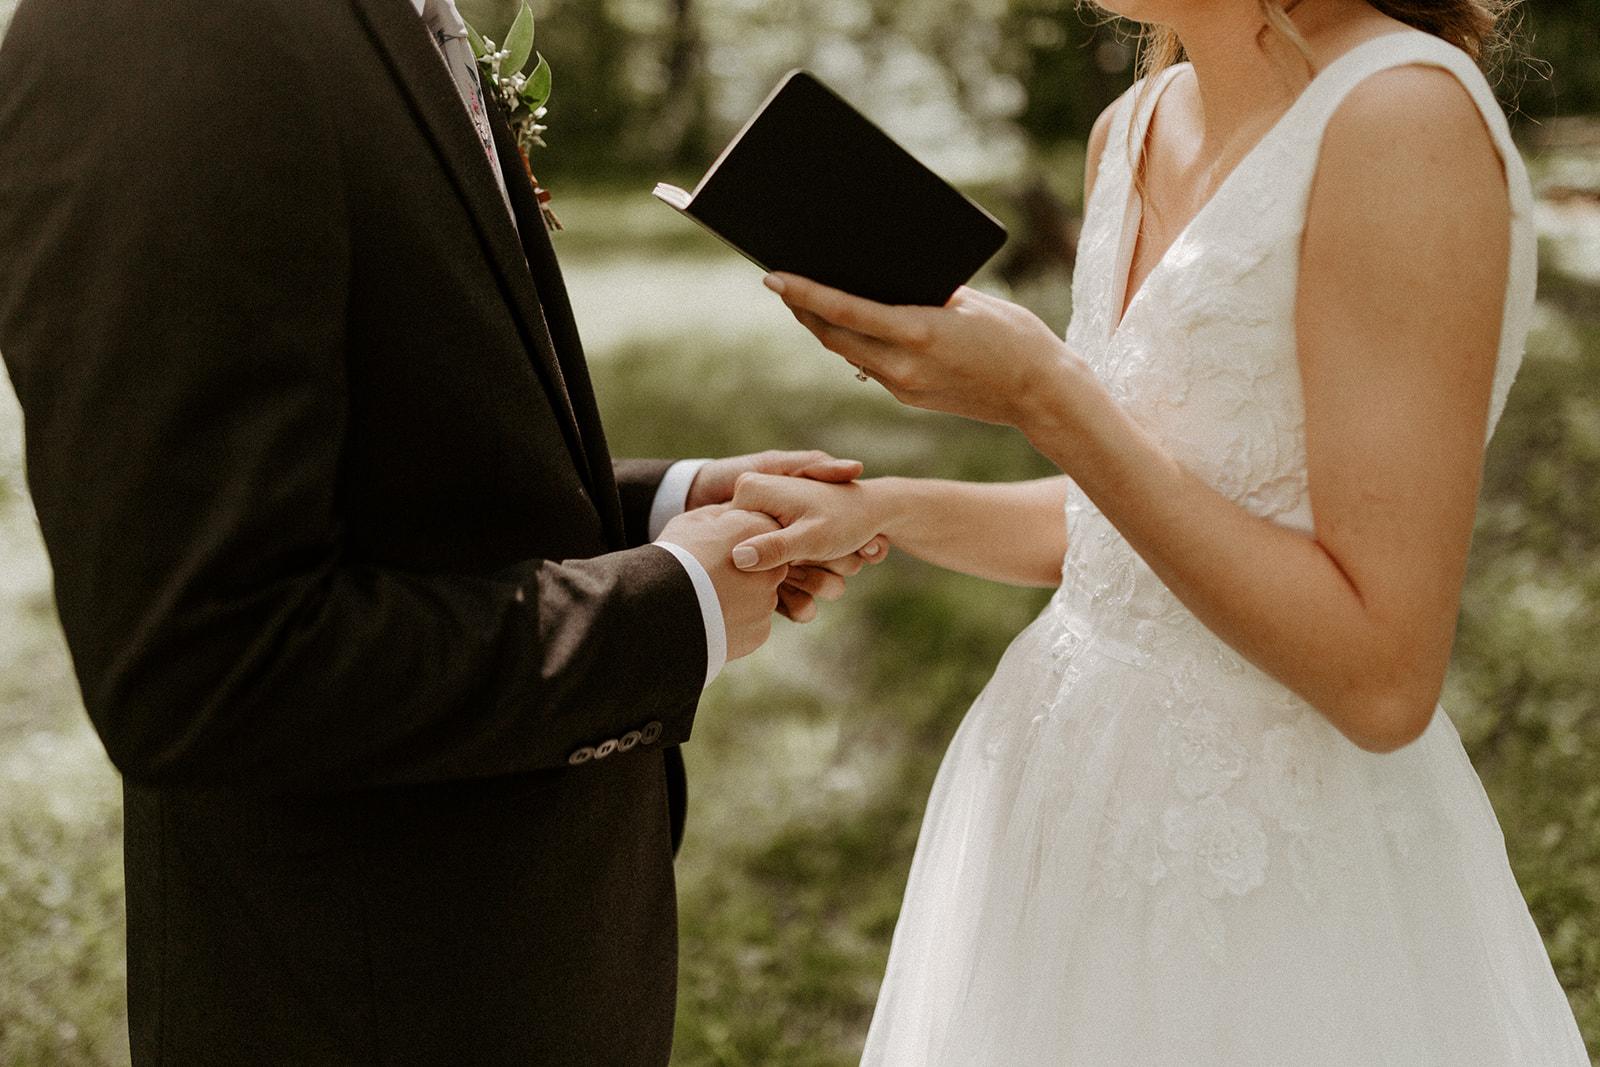 camp_wokanda_peoria_illinois_wedding_photographer_wright_photographs_bliese_0589.jpg